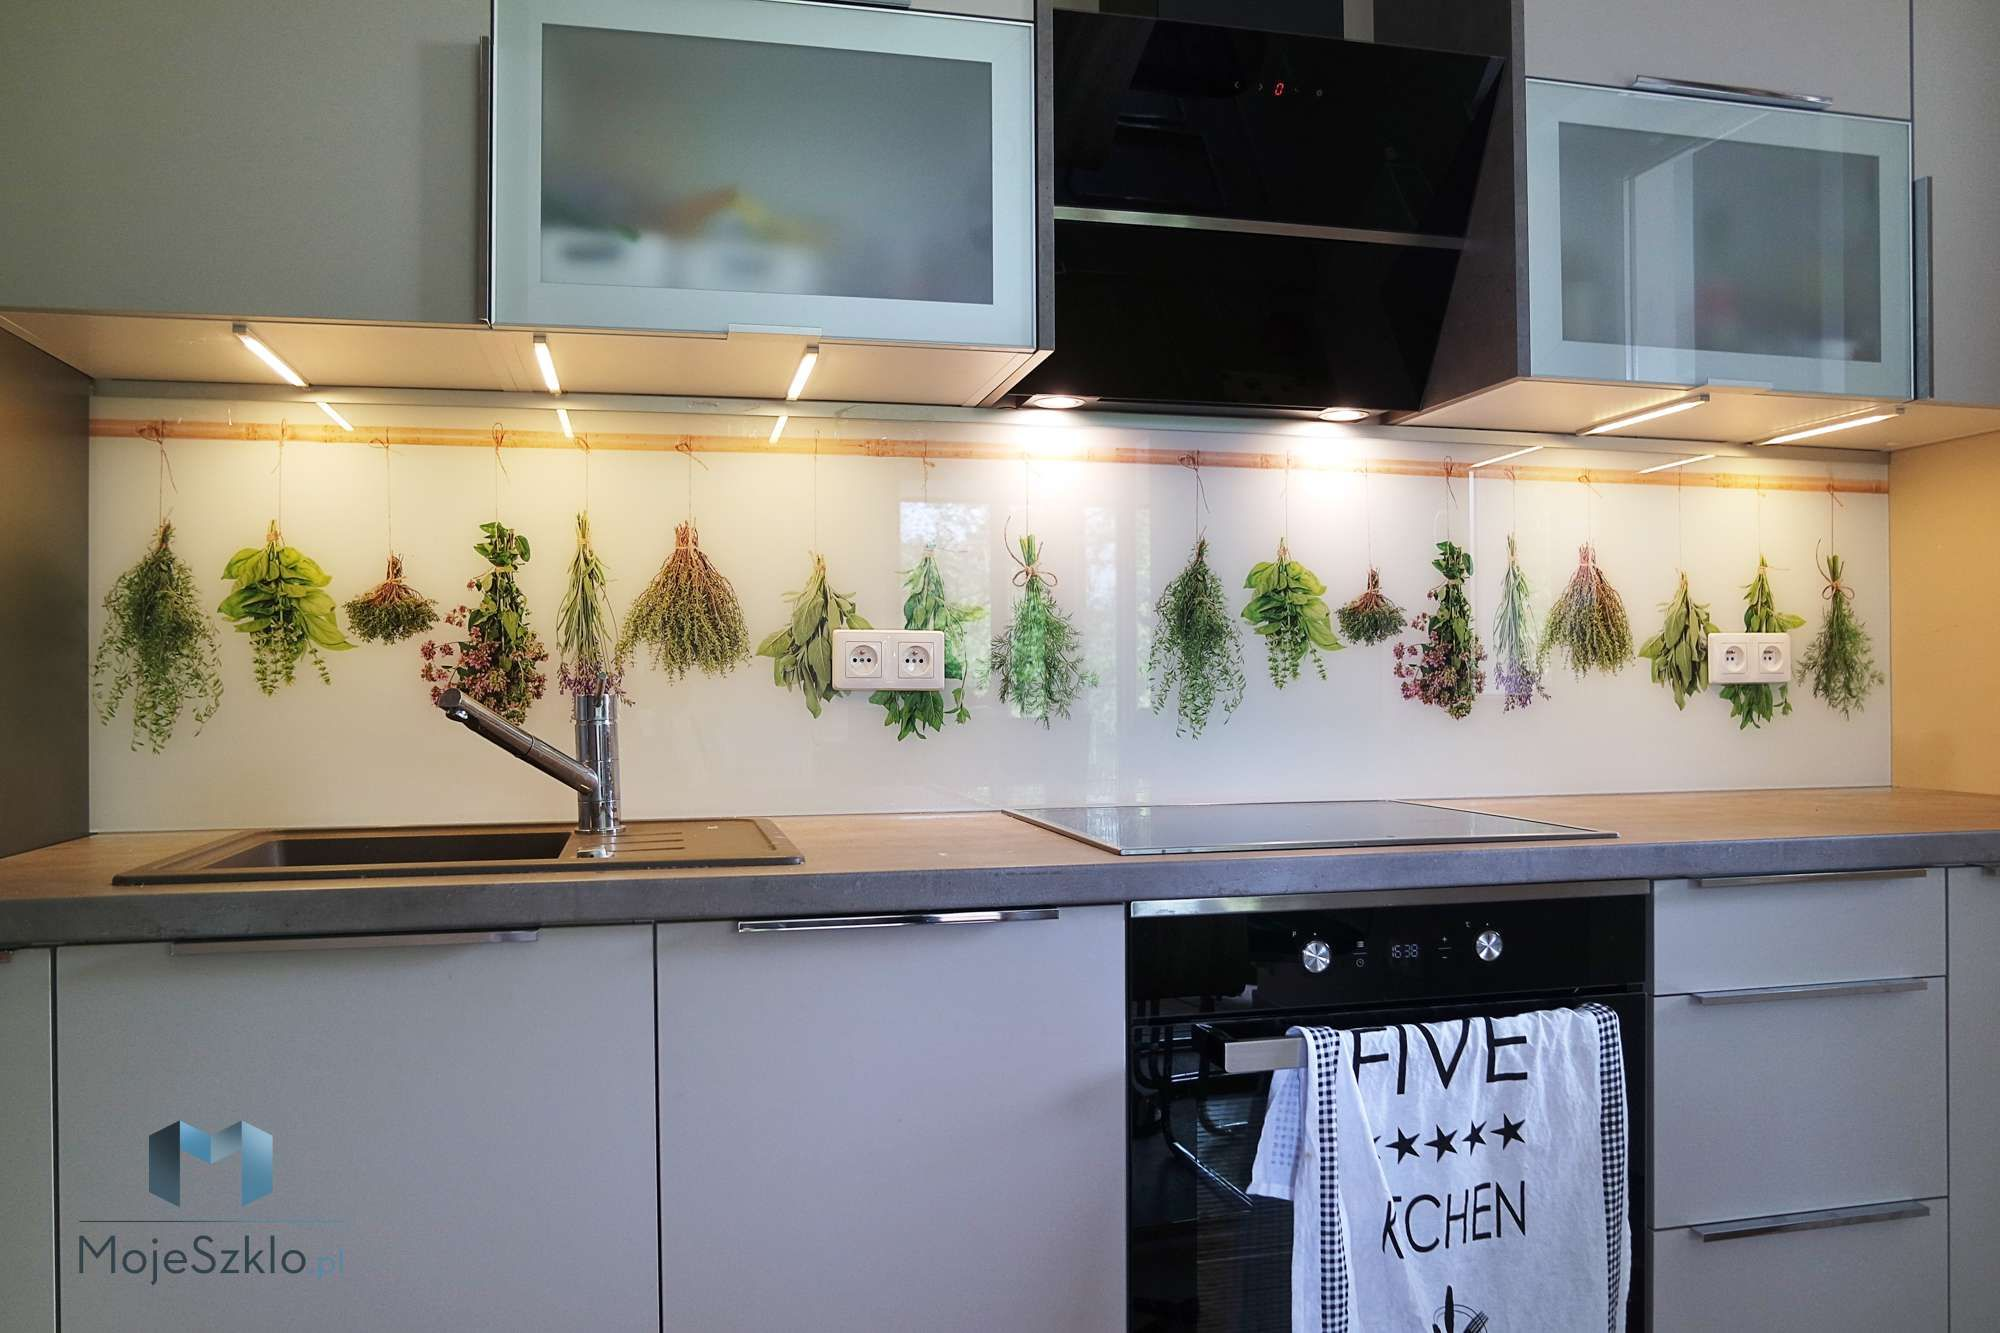 Szklany Panel Ziola Home Decor Decor Hoop Wreath